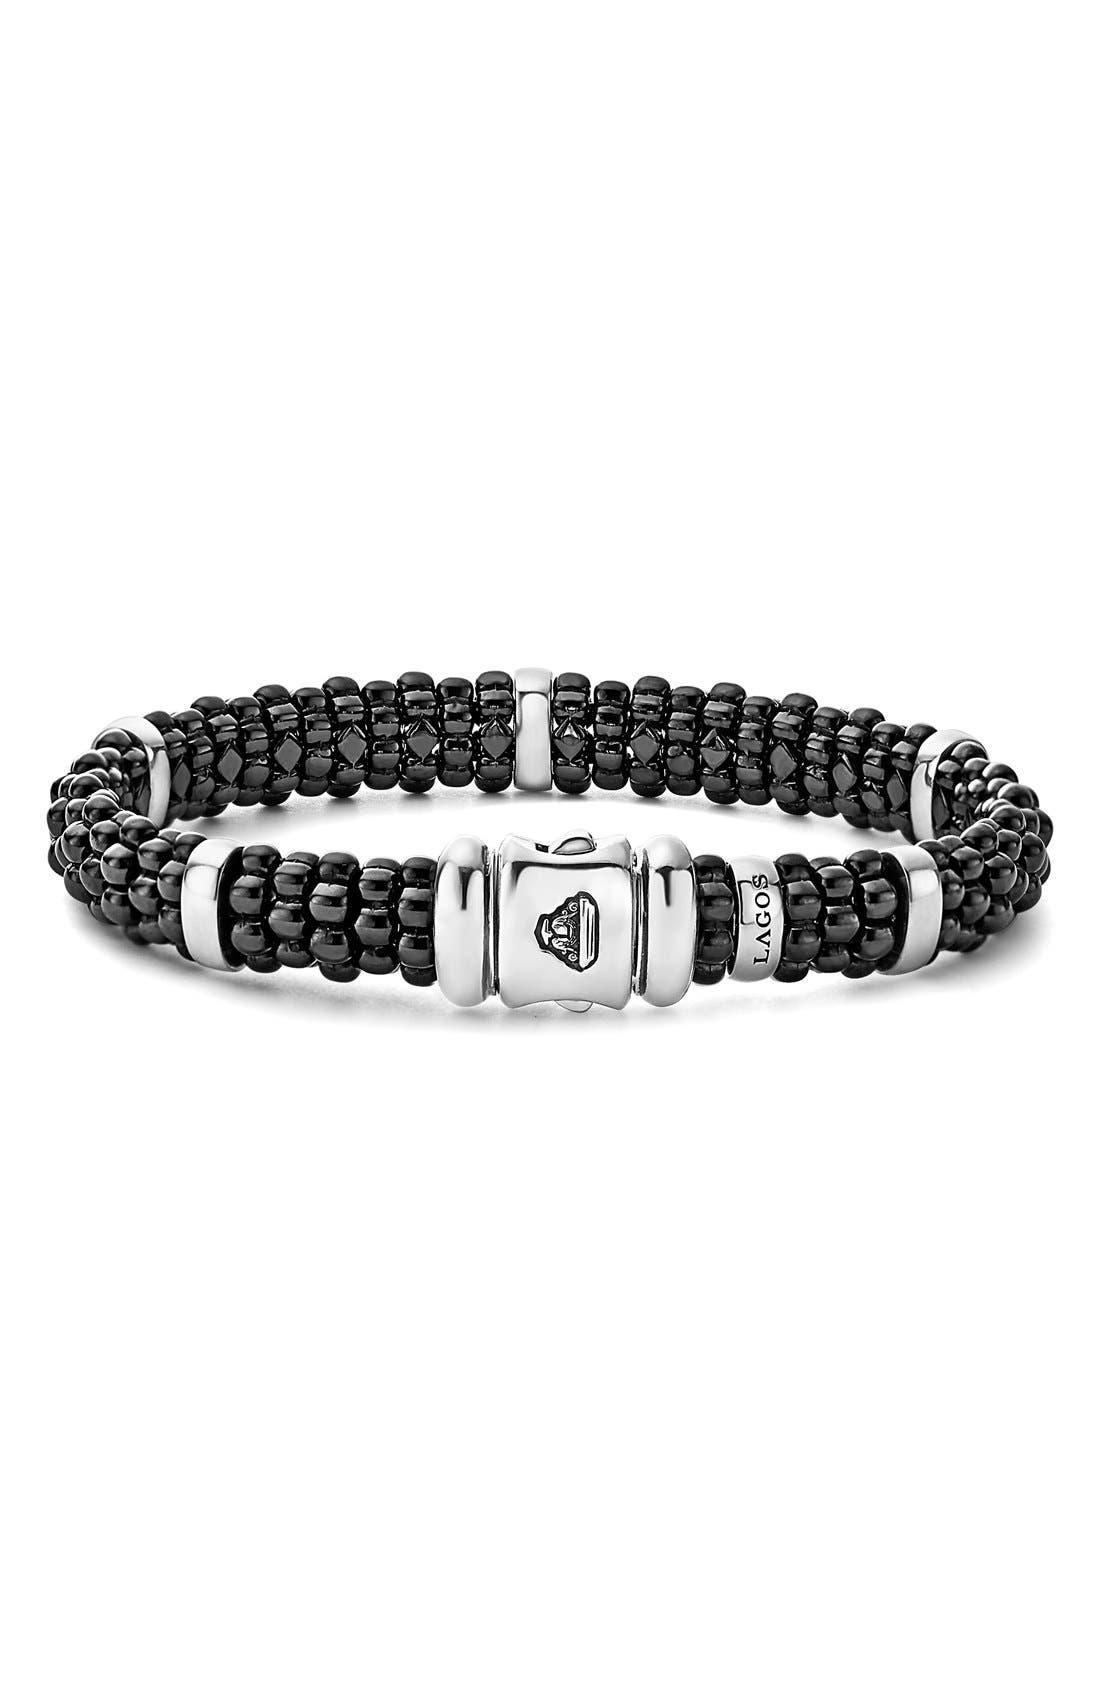 Black Caviar Station Bracelet,                             Alternate thumbnail 3, color,                             Black/ Silver/ Gold